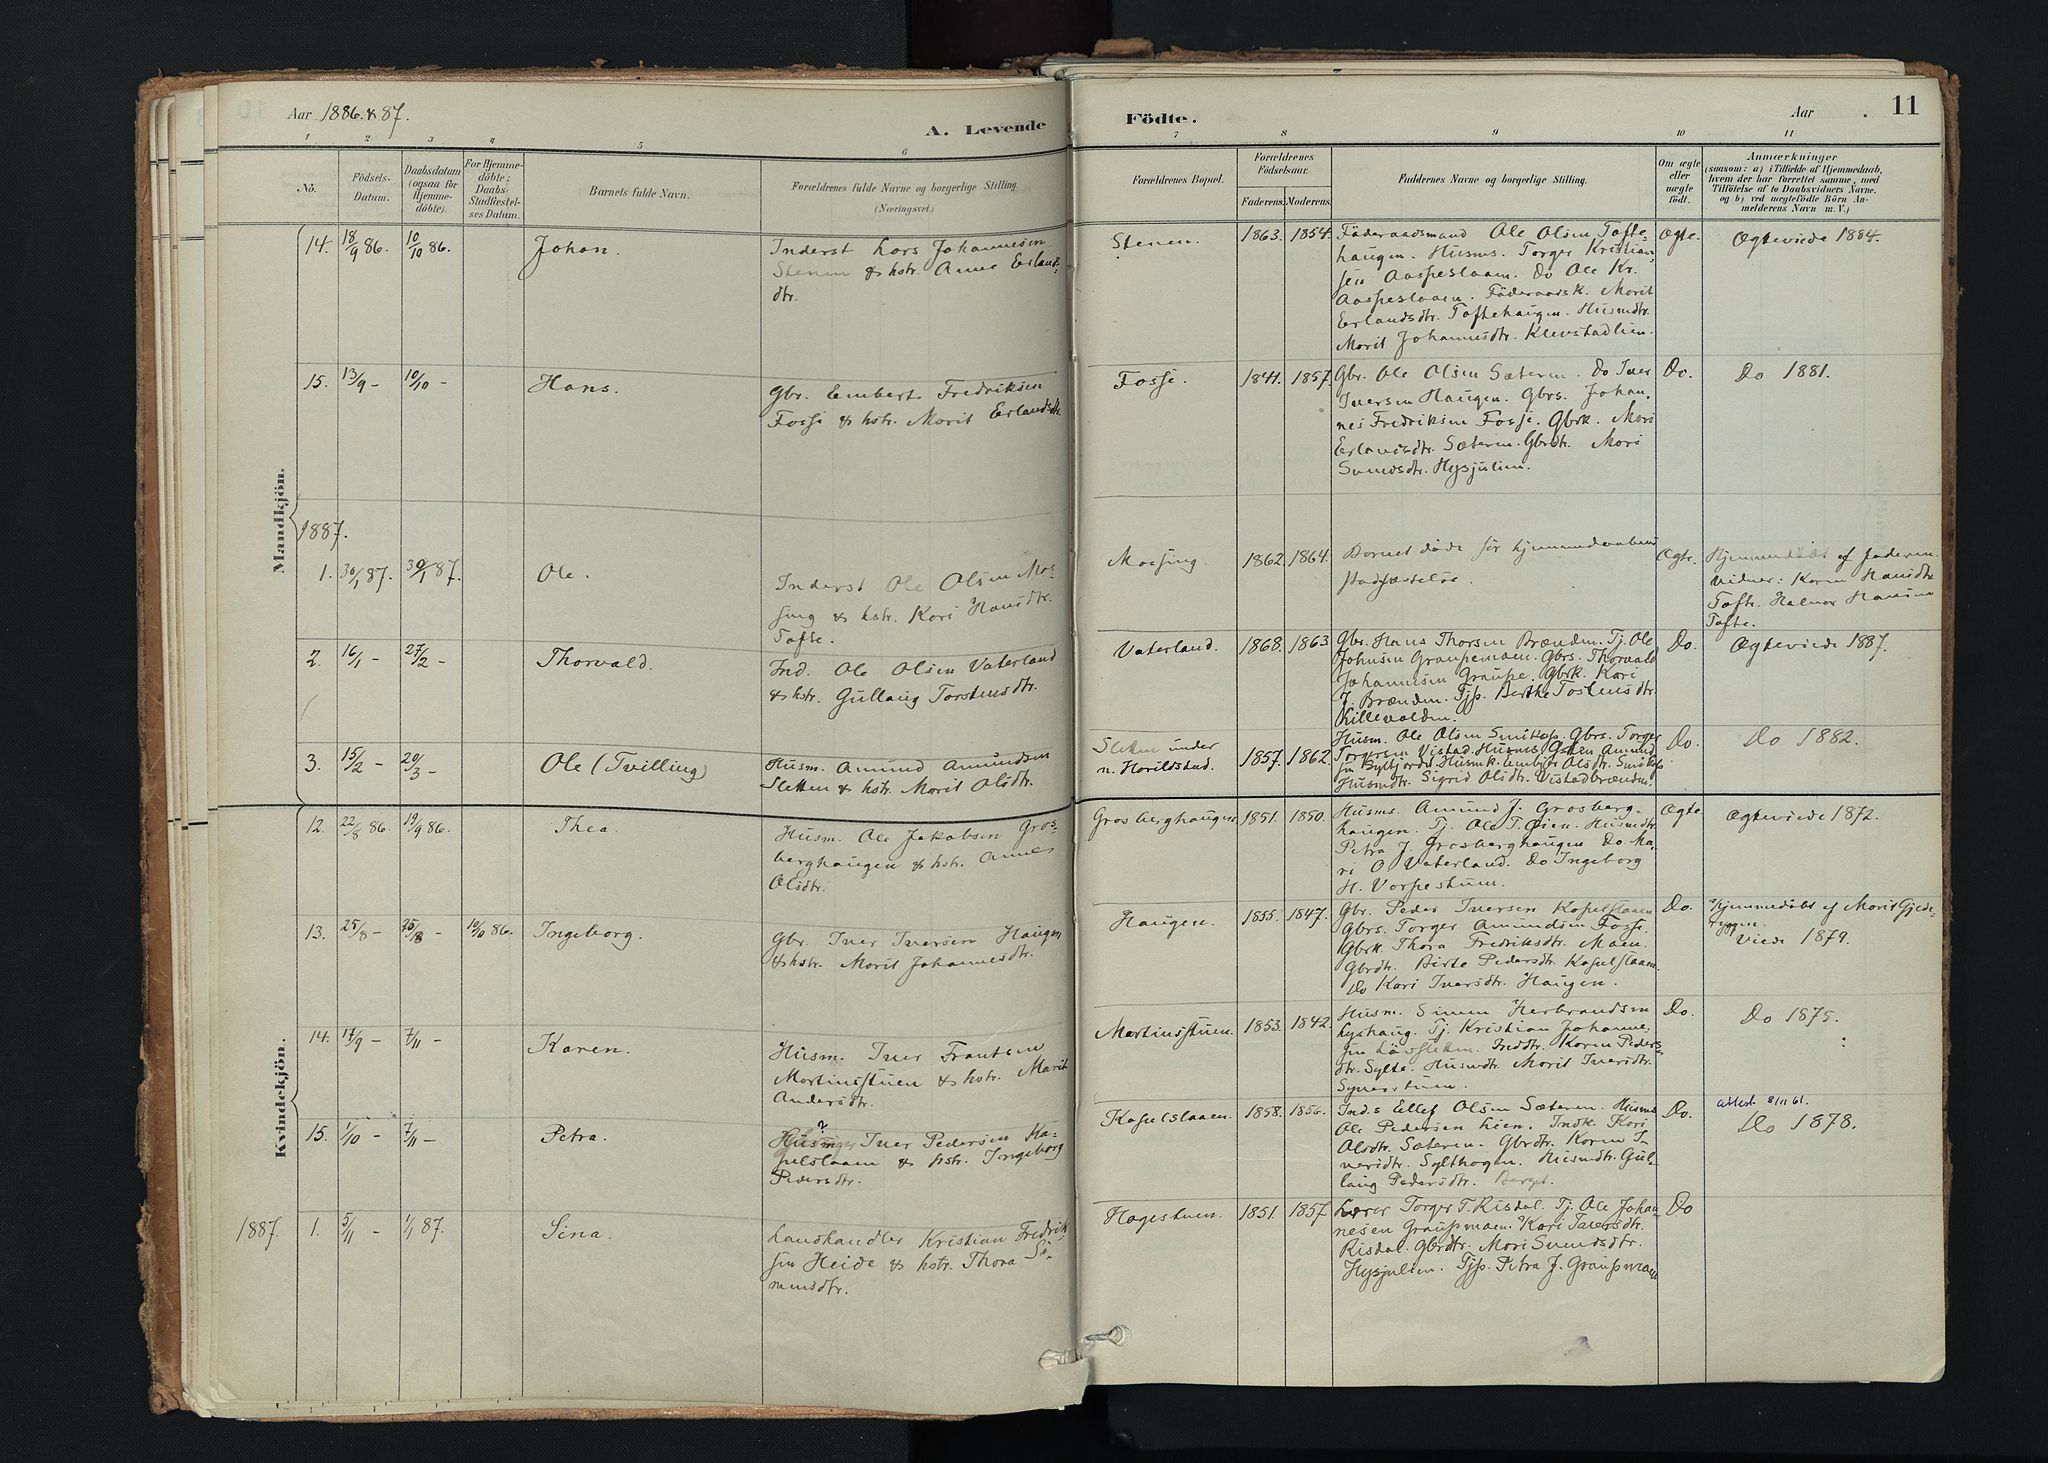 SAH, Nord-Fron prestekontor, Ministerialbok nr. 5, 1884-1914, s. 11